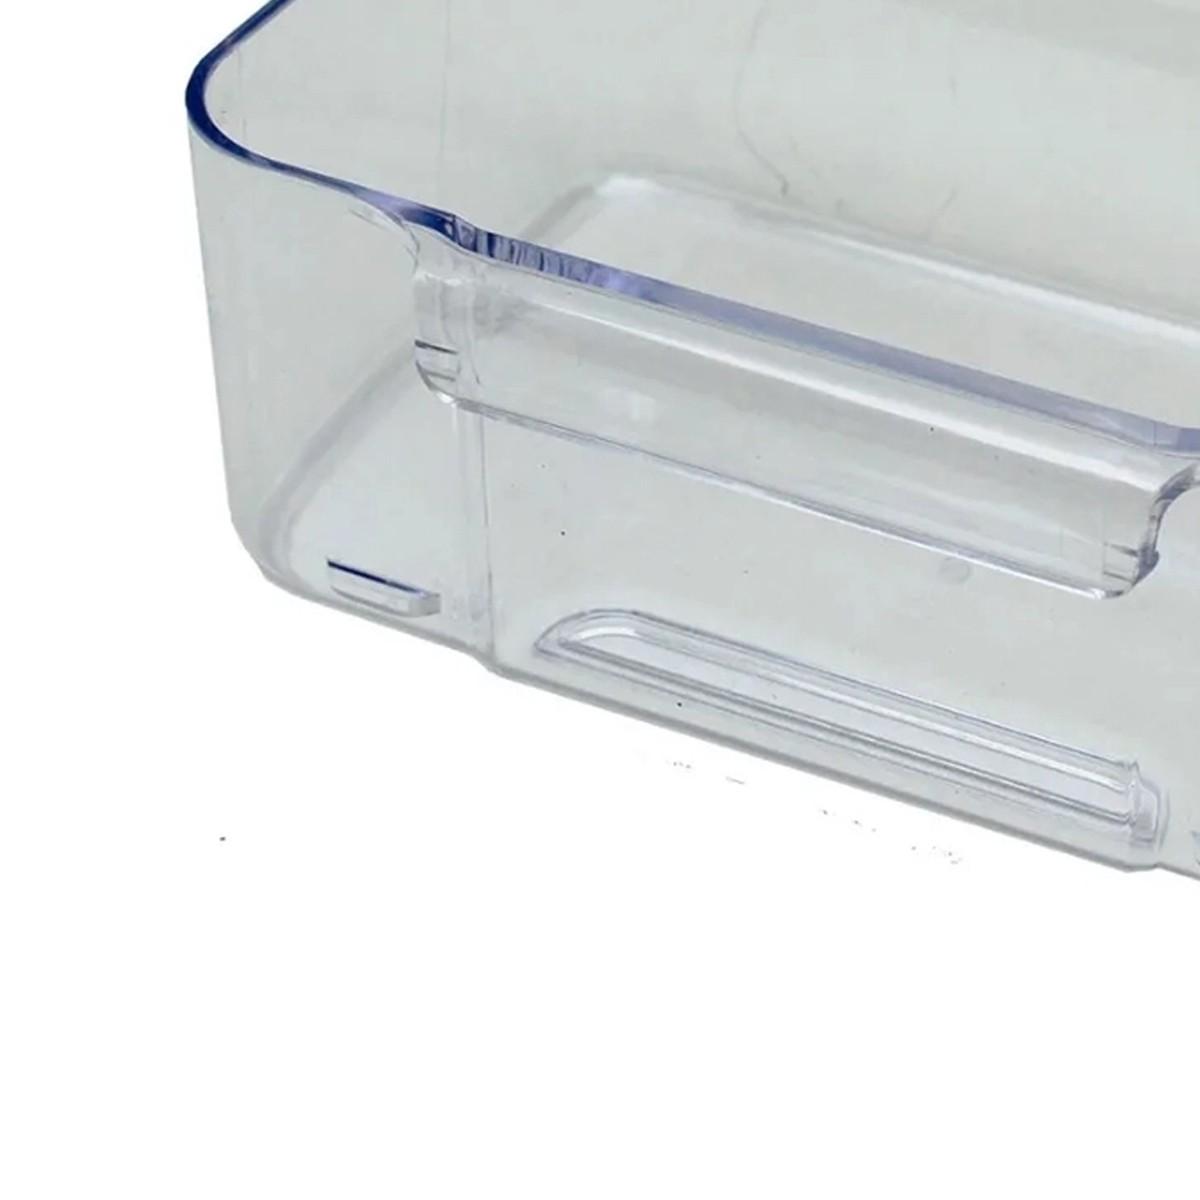 Prateleira 1/3 Porta Do Refrigerador Frost Free Electrolux IF55 IF55S TF55 TF55S -  A96920202